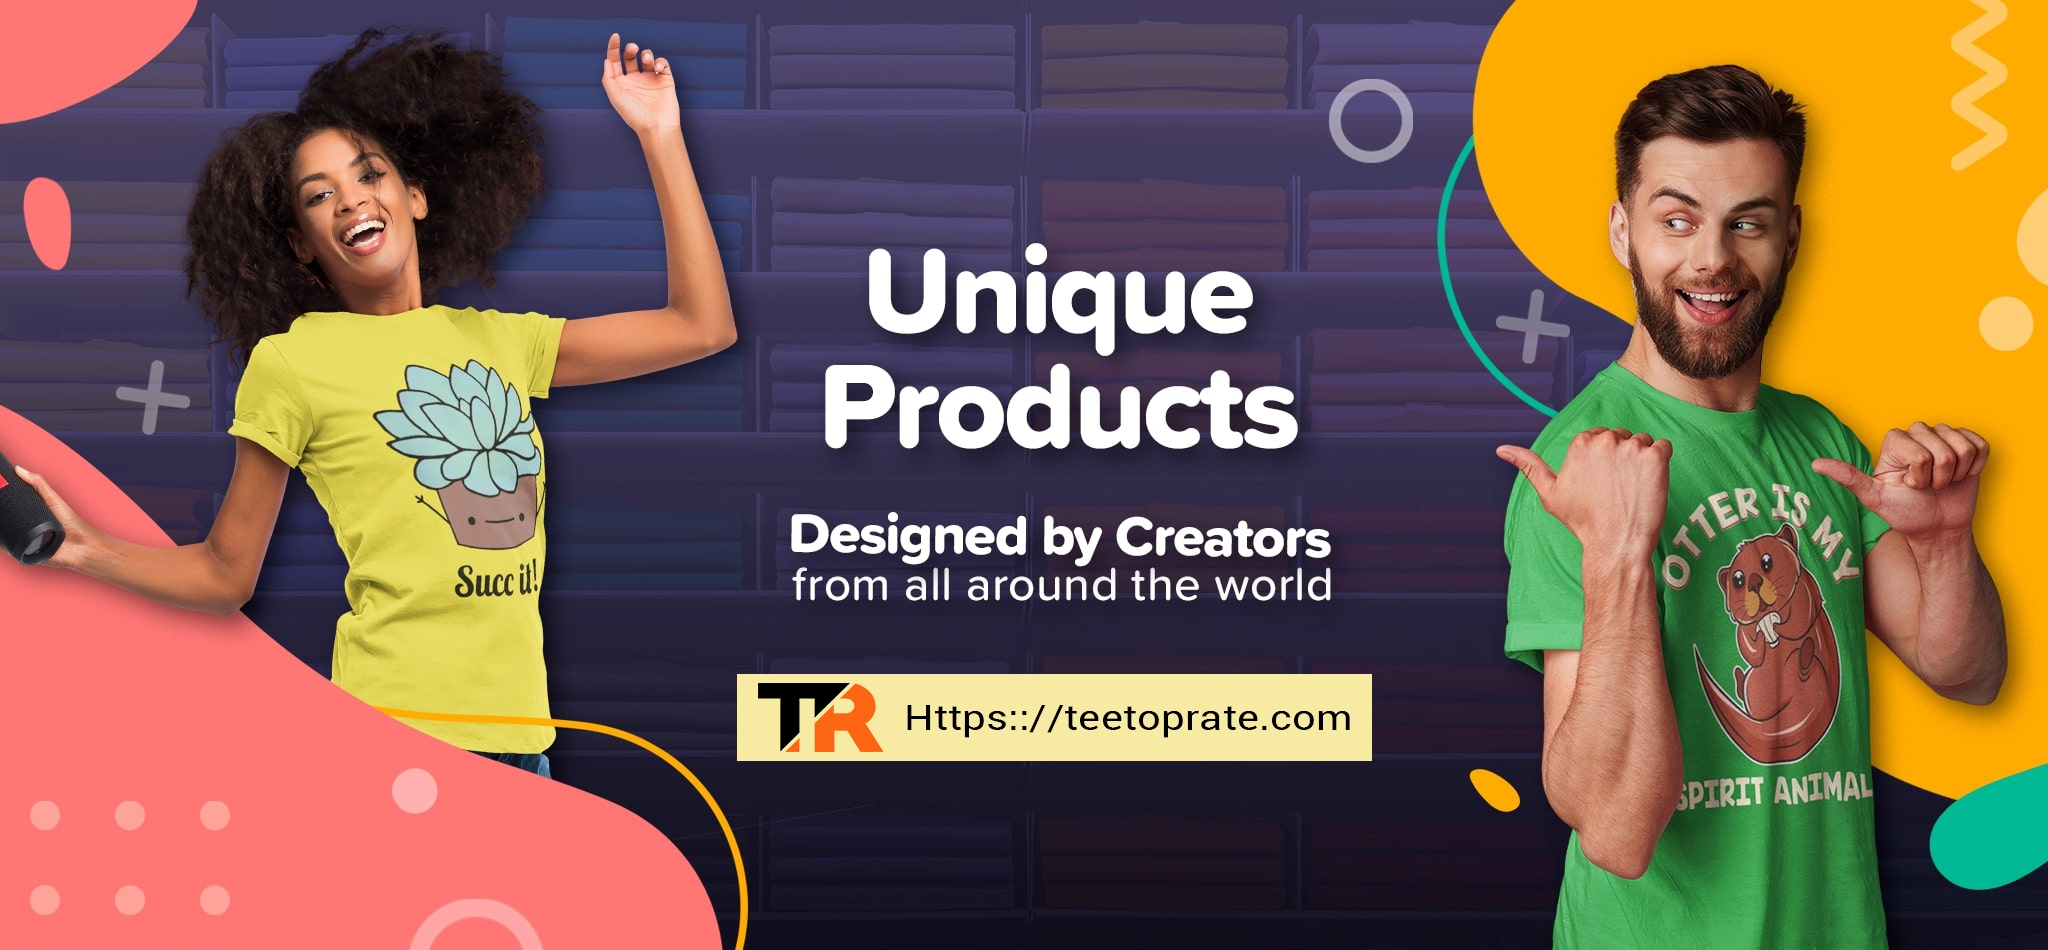 Teetoprate Store (@teetoprate) Cover Image